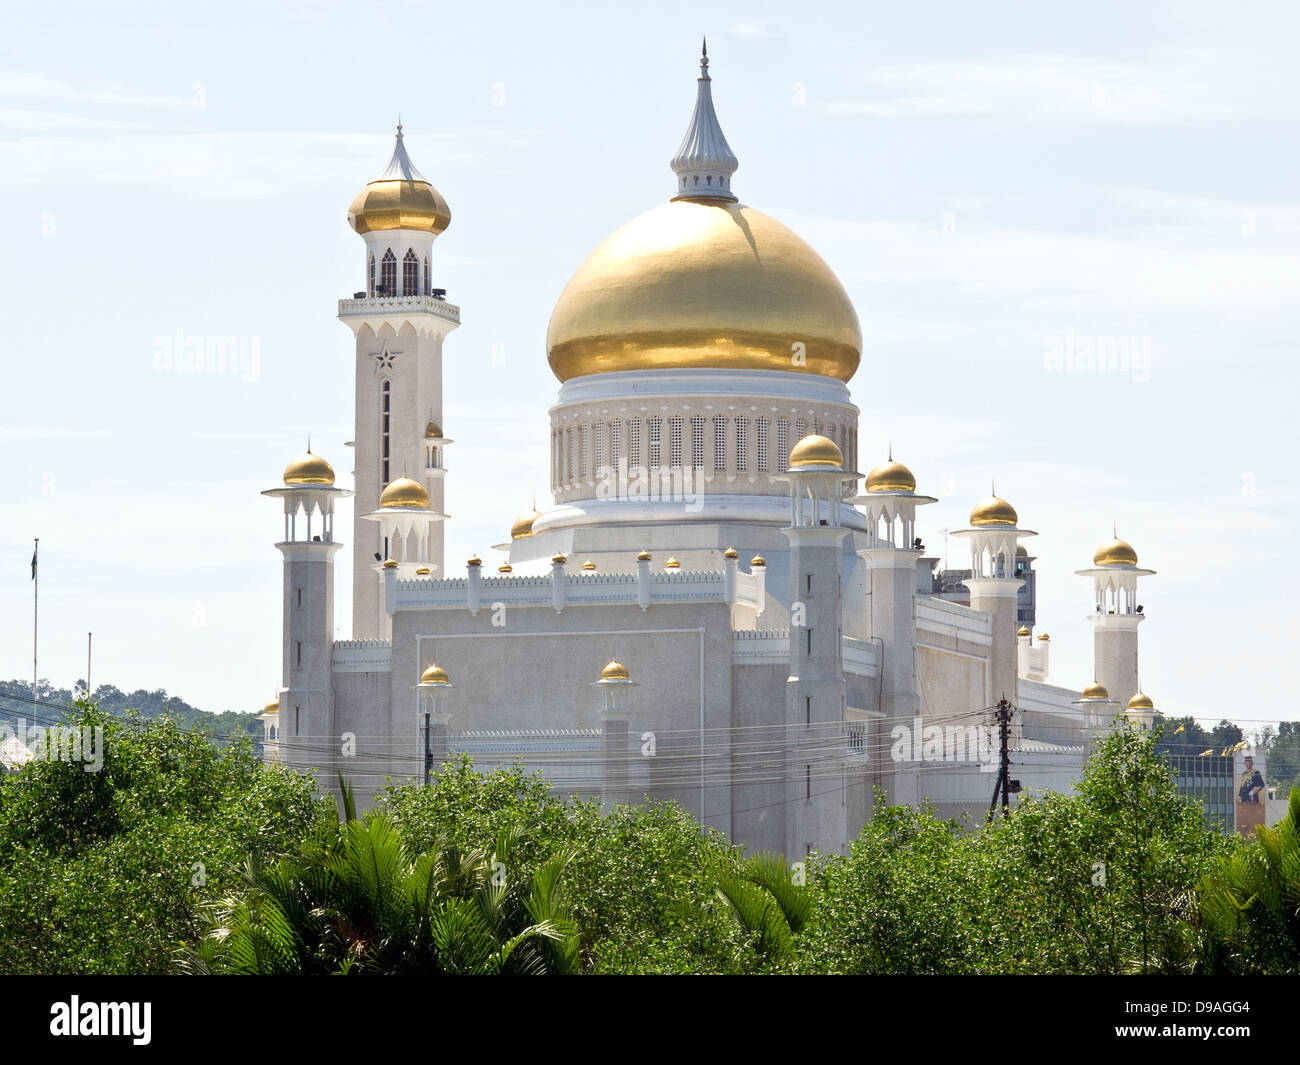 Sultan Omar Ali Saifuddien Islamic mosque located in Bandar Seri Begawan, the capital of the Sultanate of Brunei. - Stock Image